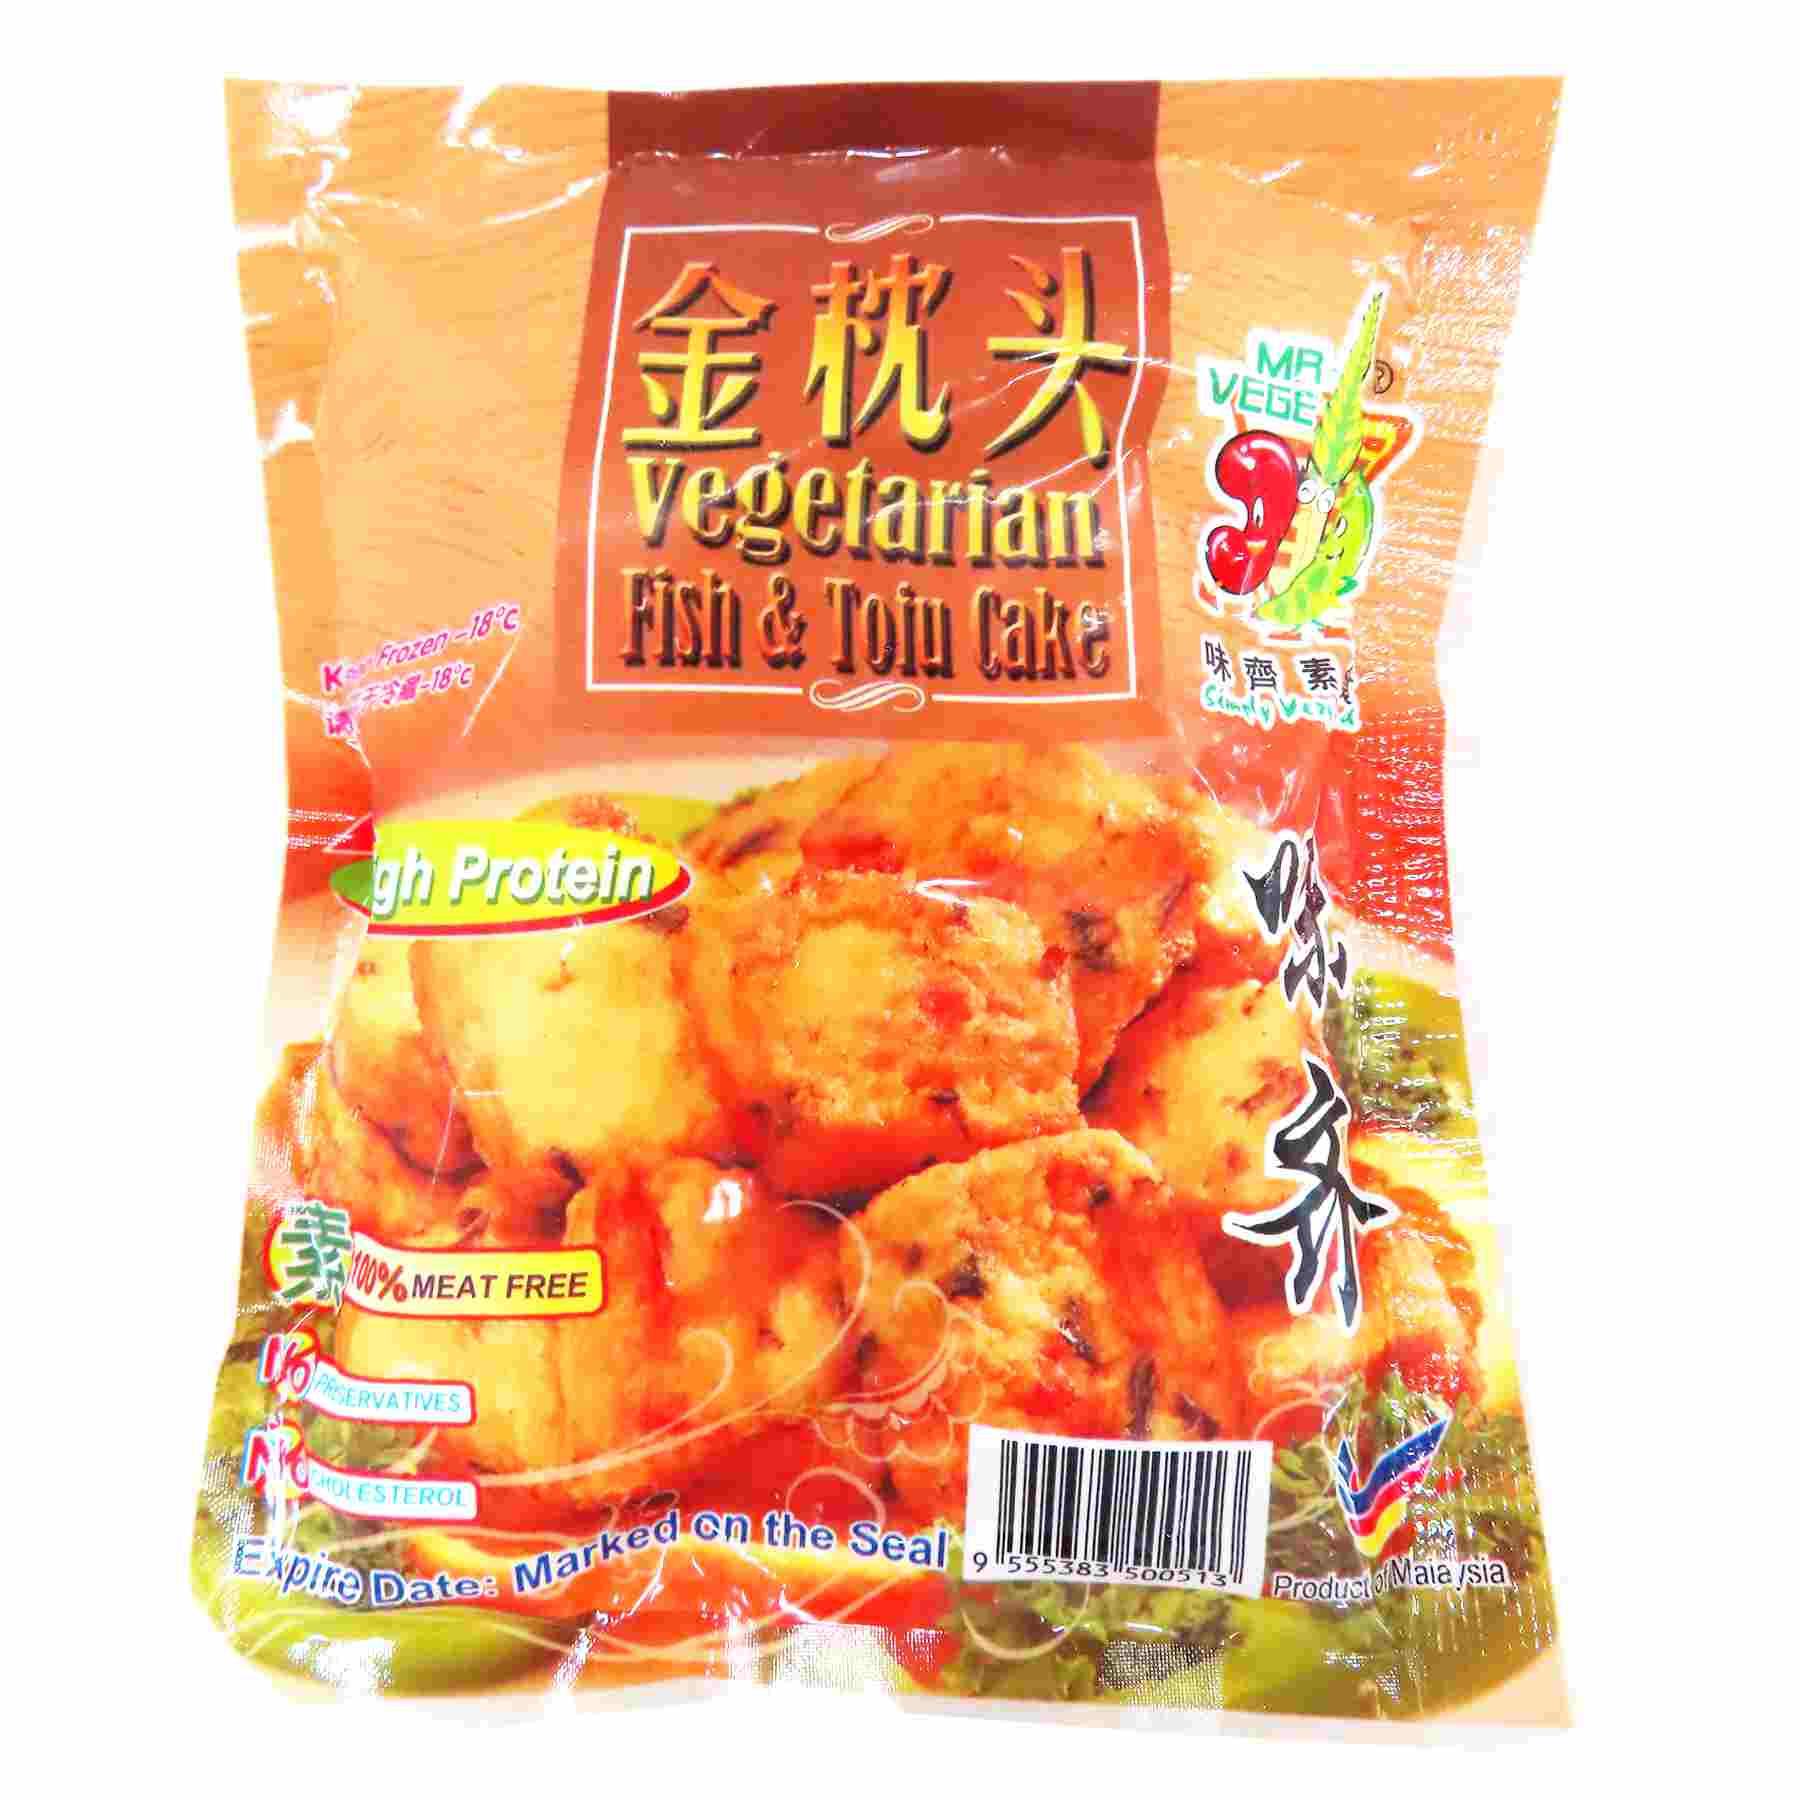 Image Veg Fish&Tofu Cake 味齐 - 金枕头 240grams